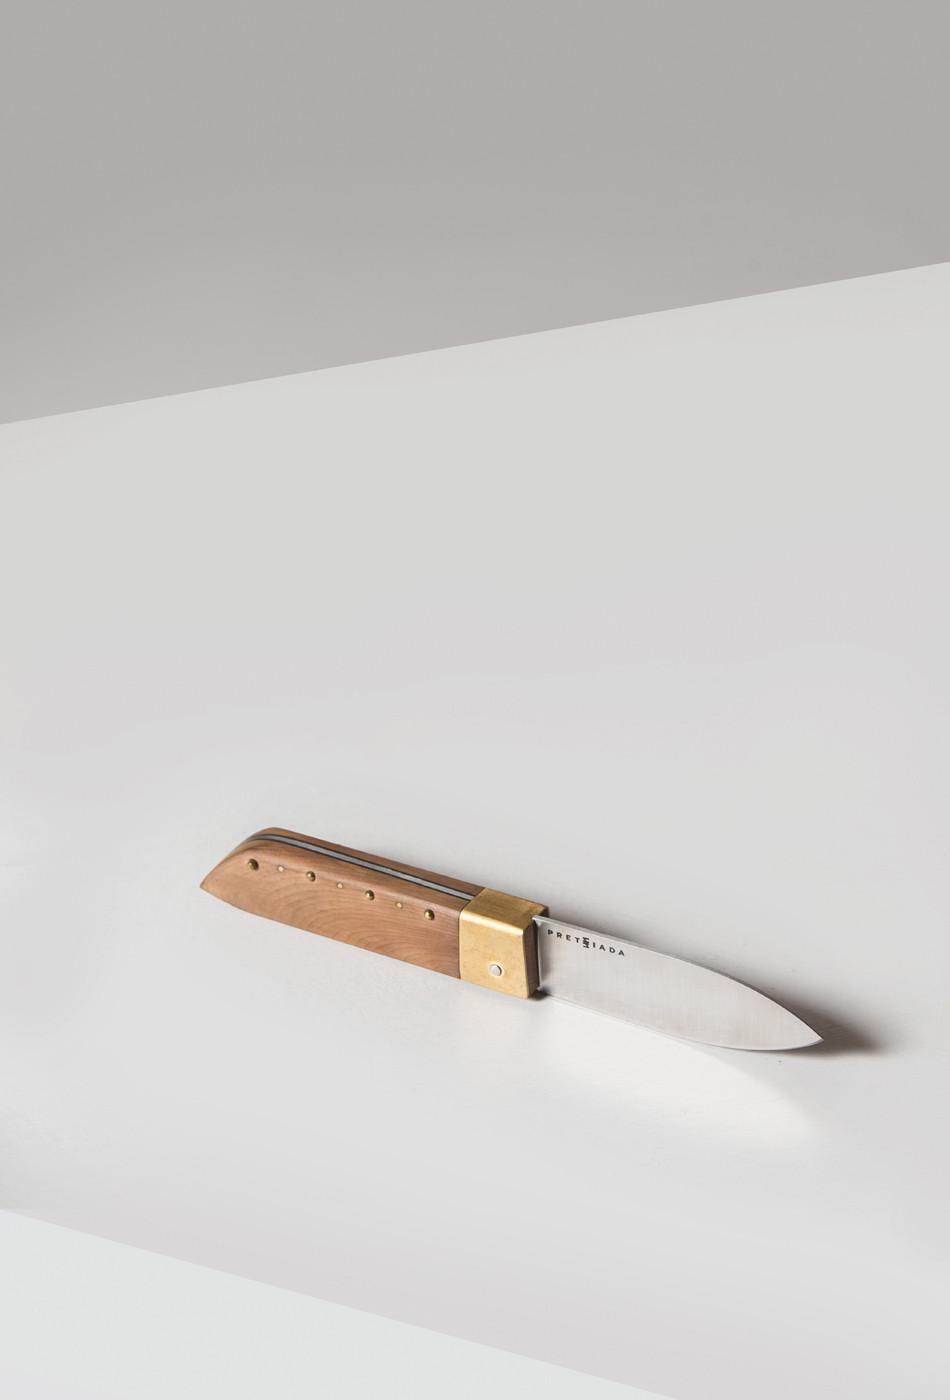 PretziadaKnife-Side.jpg